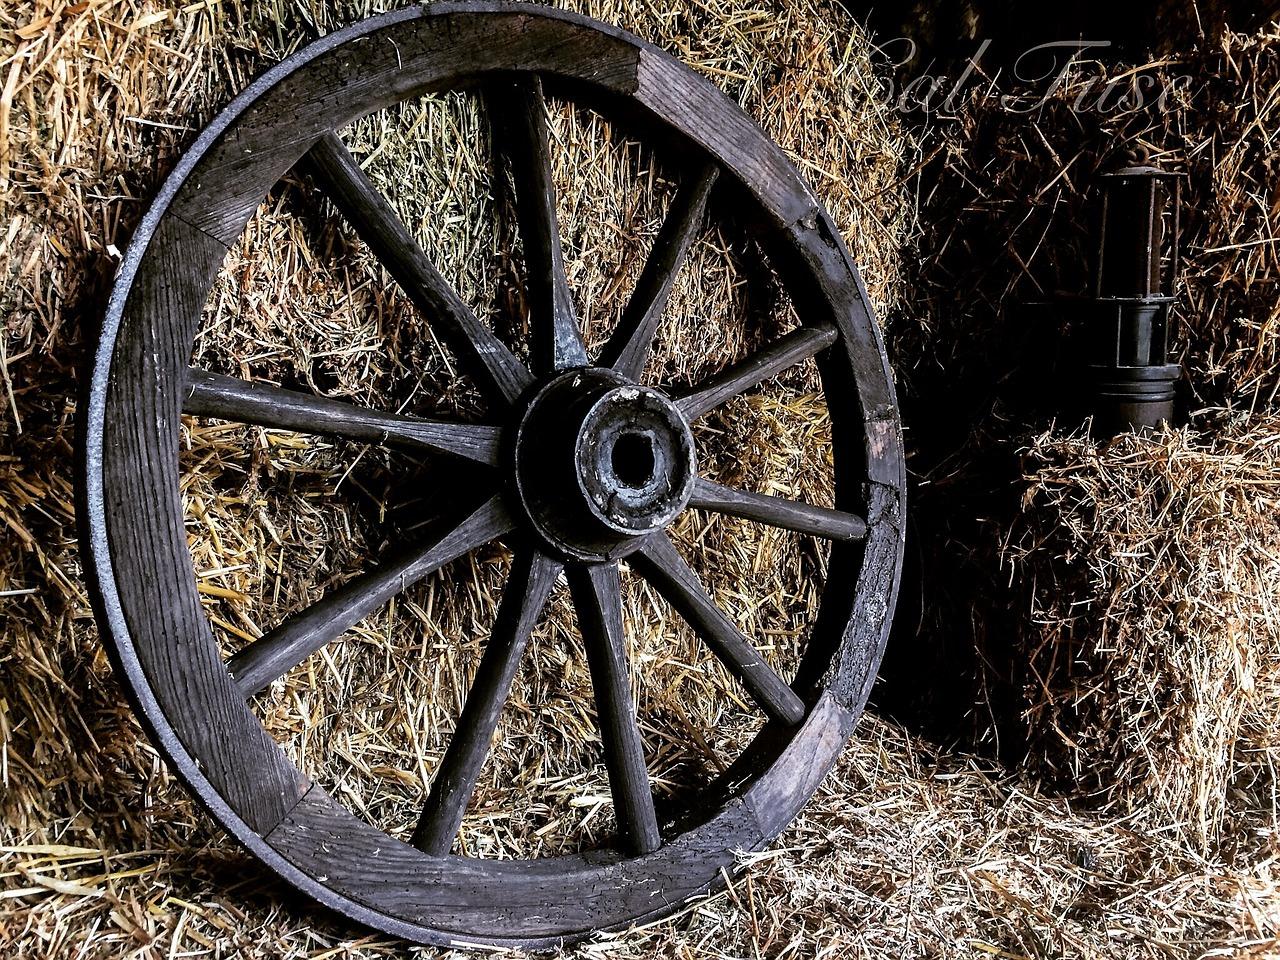 картинка колесо и повозка там было